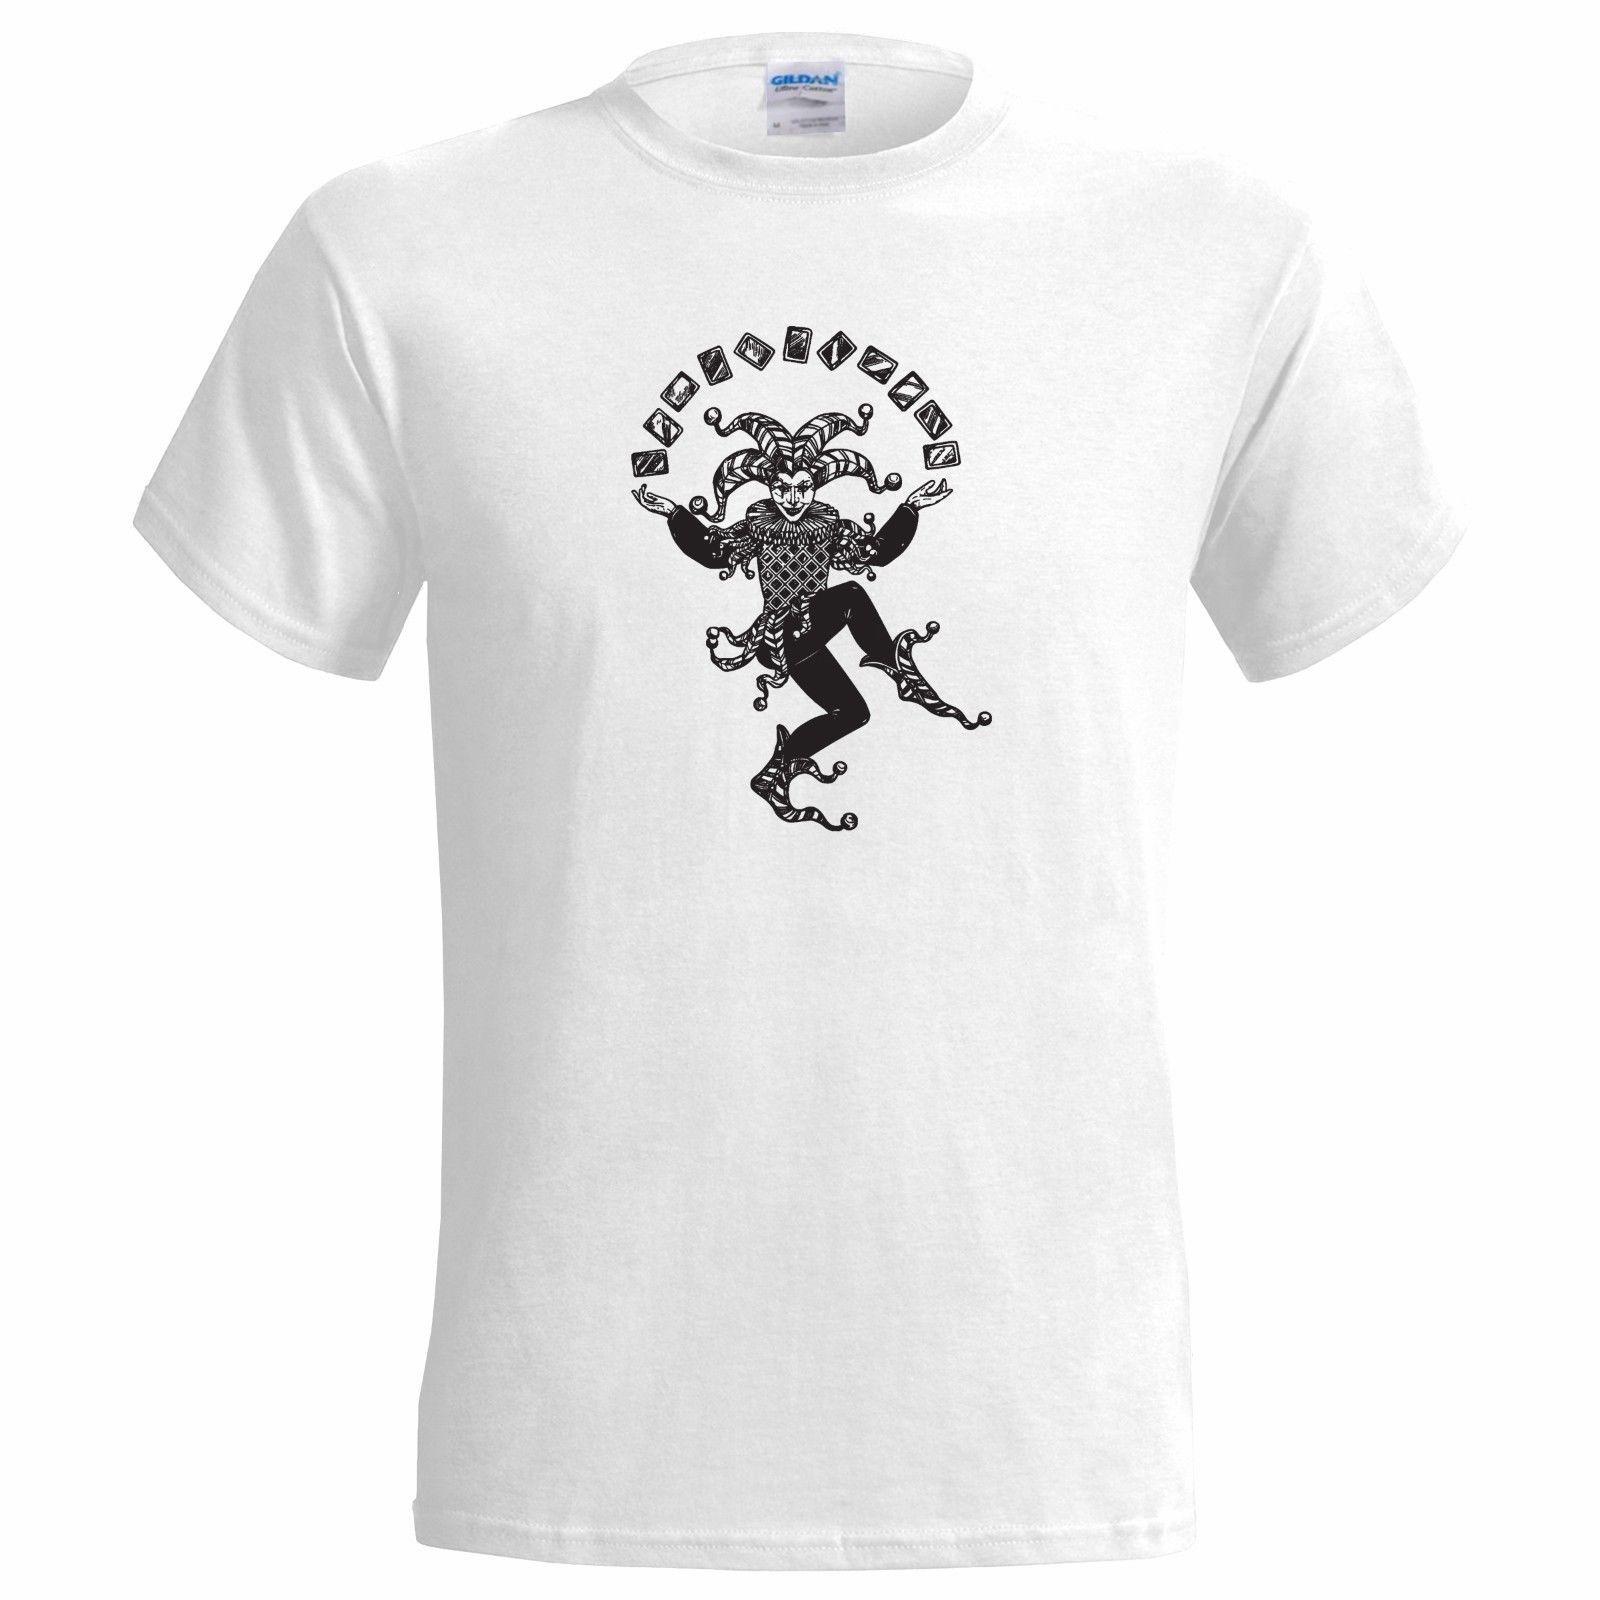 949849f1 Joker Card Juggler MENS T SHIRT Jester Magic Tarot Poker Playing Cards Deck Of  Funny 100% Cotton T Shirt Fear Cosplay Liverpoott Tshirt Mens Tee Shirts  Rude ...